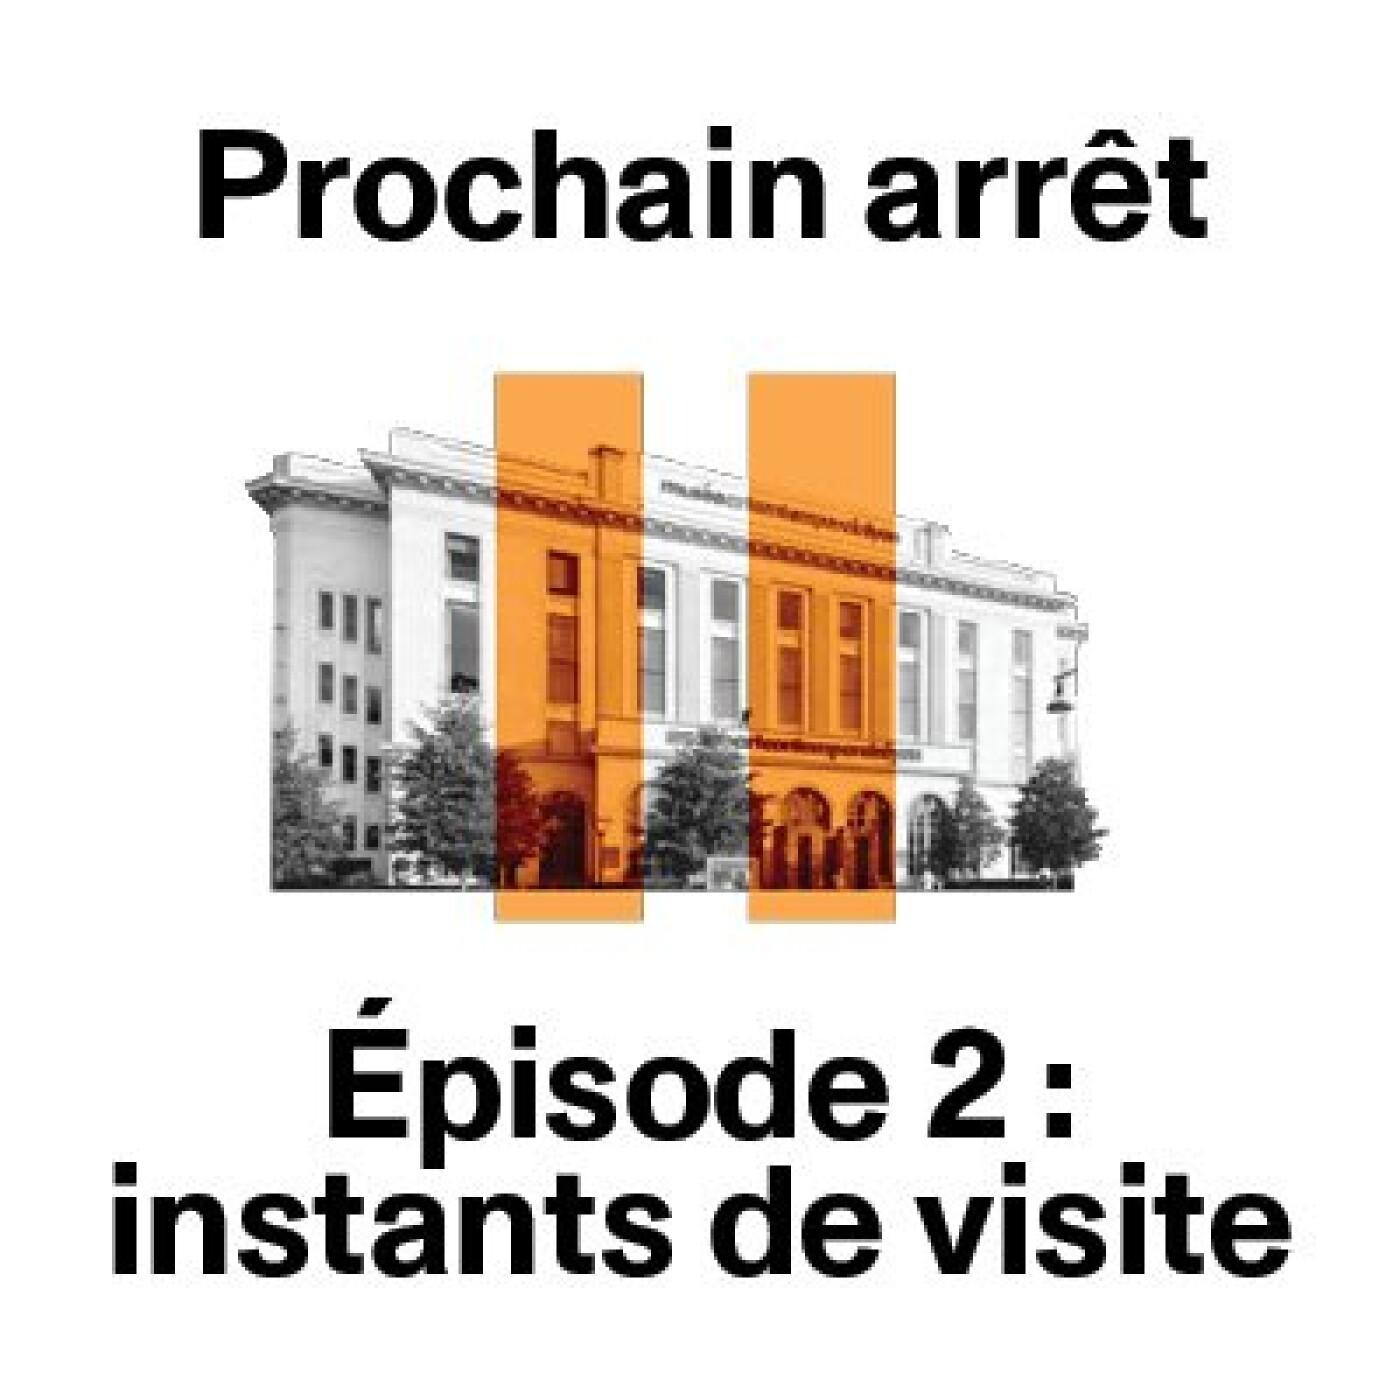 Episode 2 : instants de visite